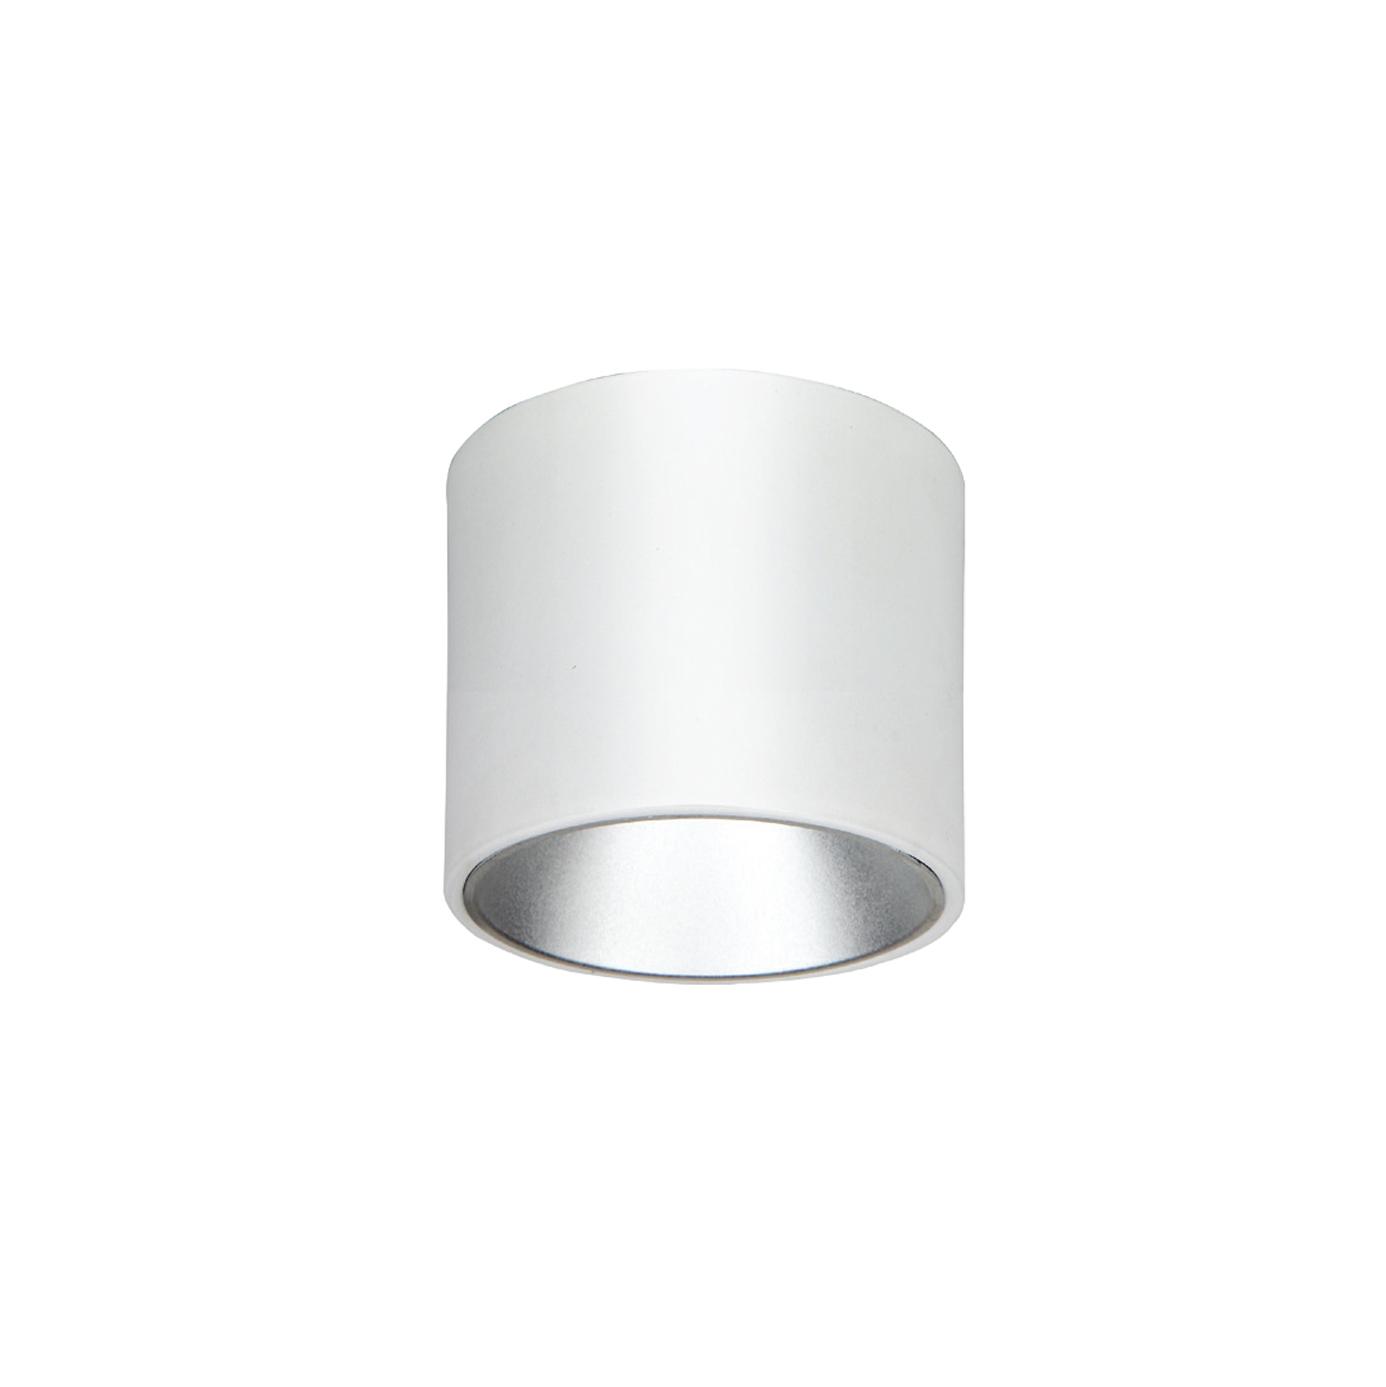 چراغ هاى سقفى ریلى-SH-4016-7W